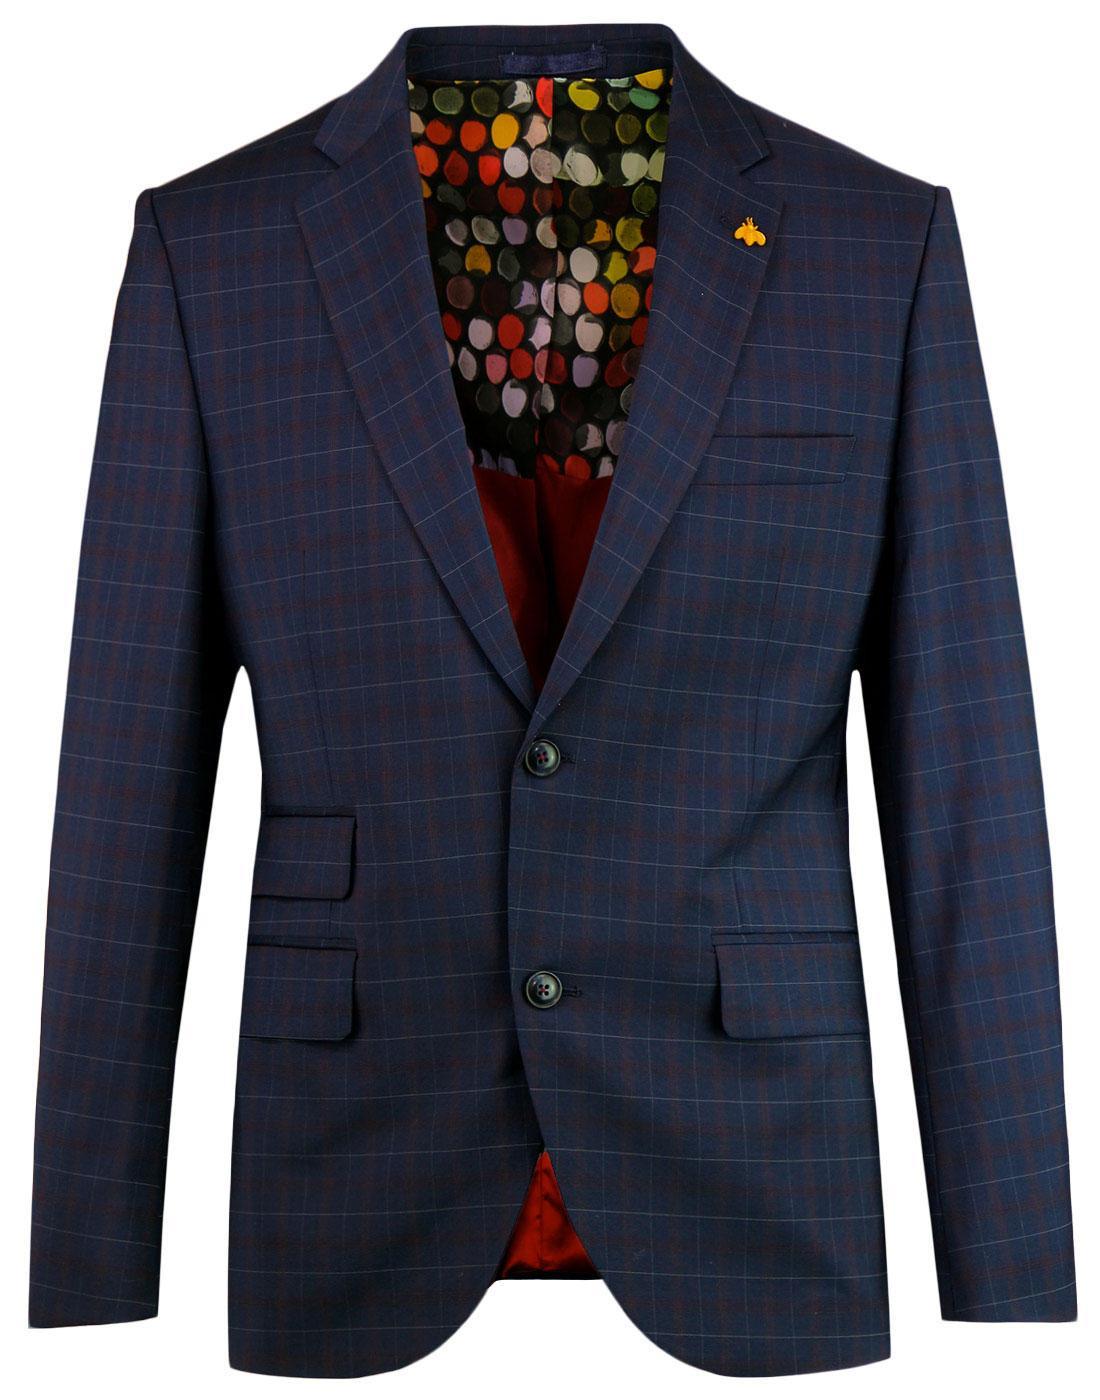 Marriott GIBSON LONDON Tartan Check Suit Jacket